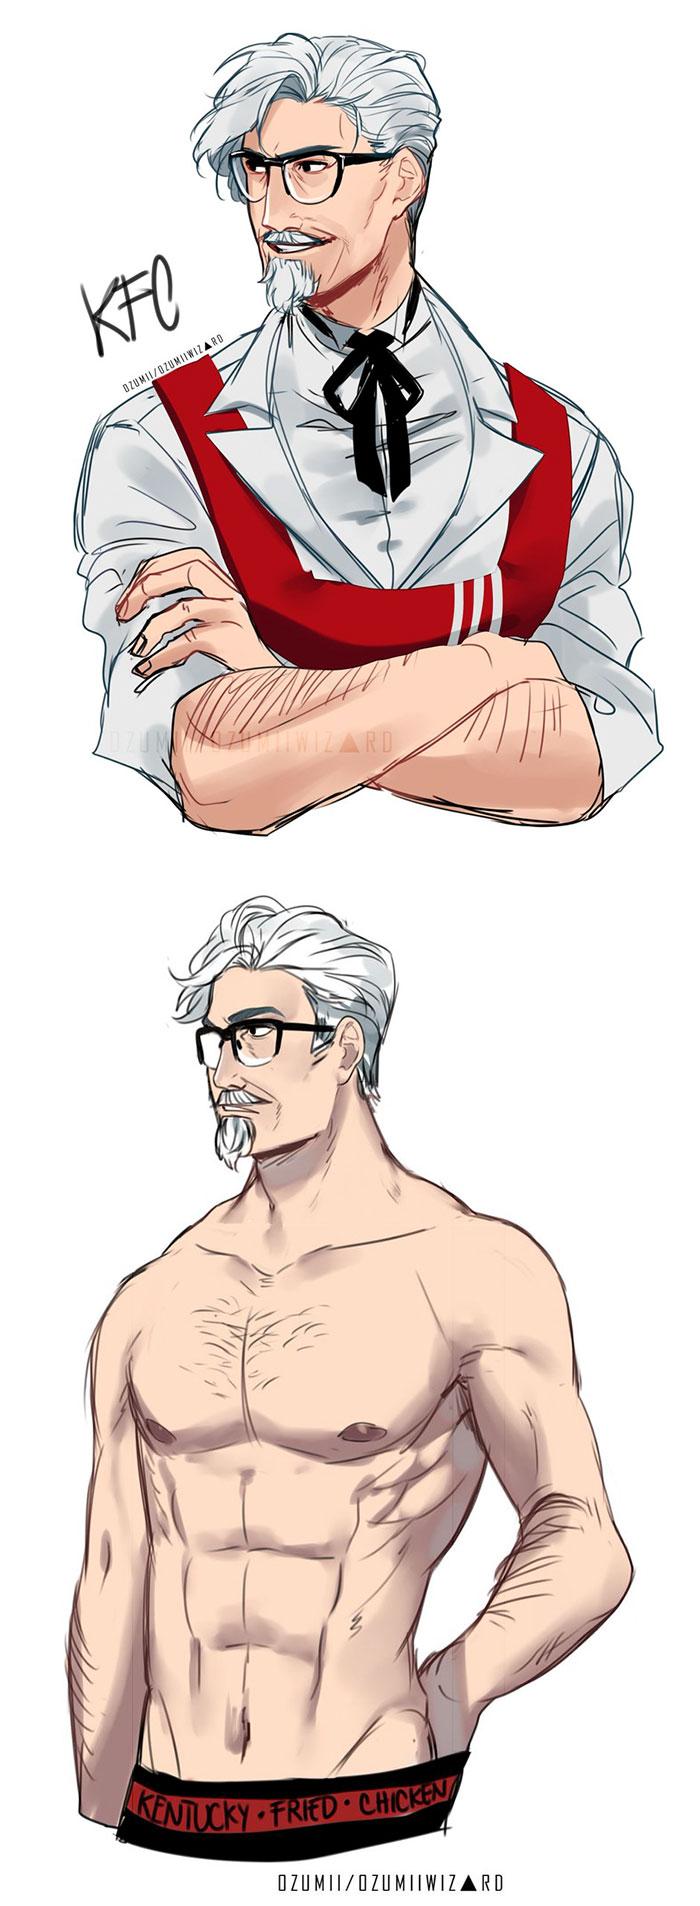 1 KFC Colonel Sanders